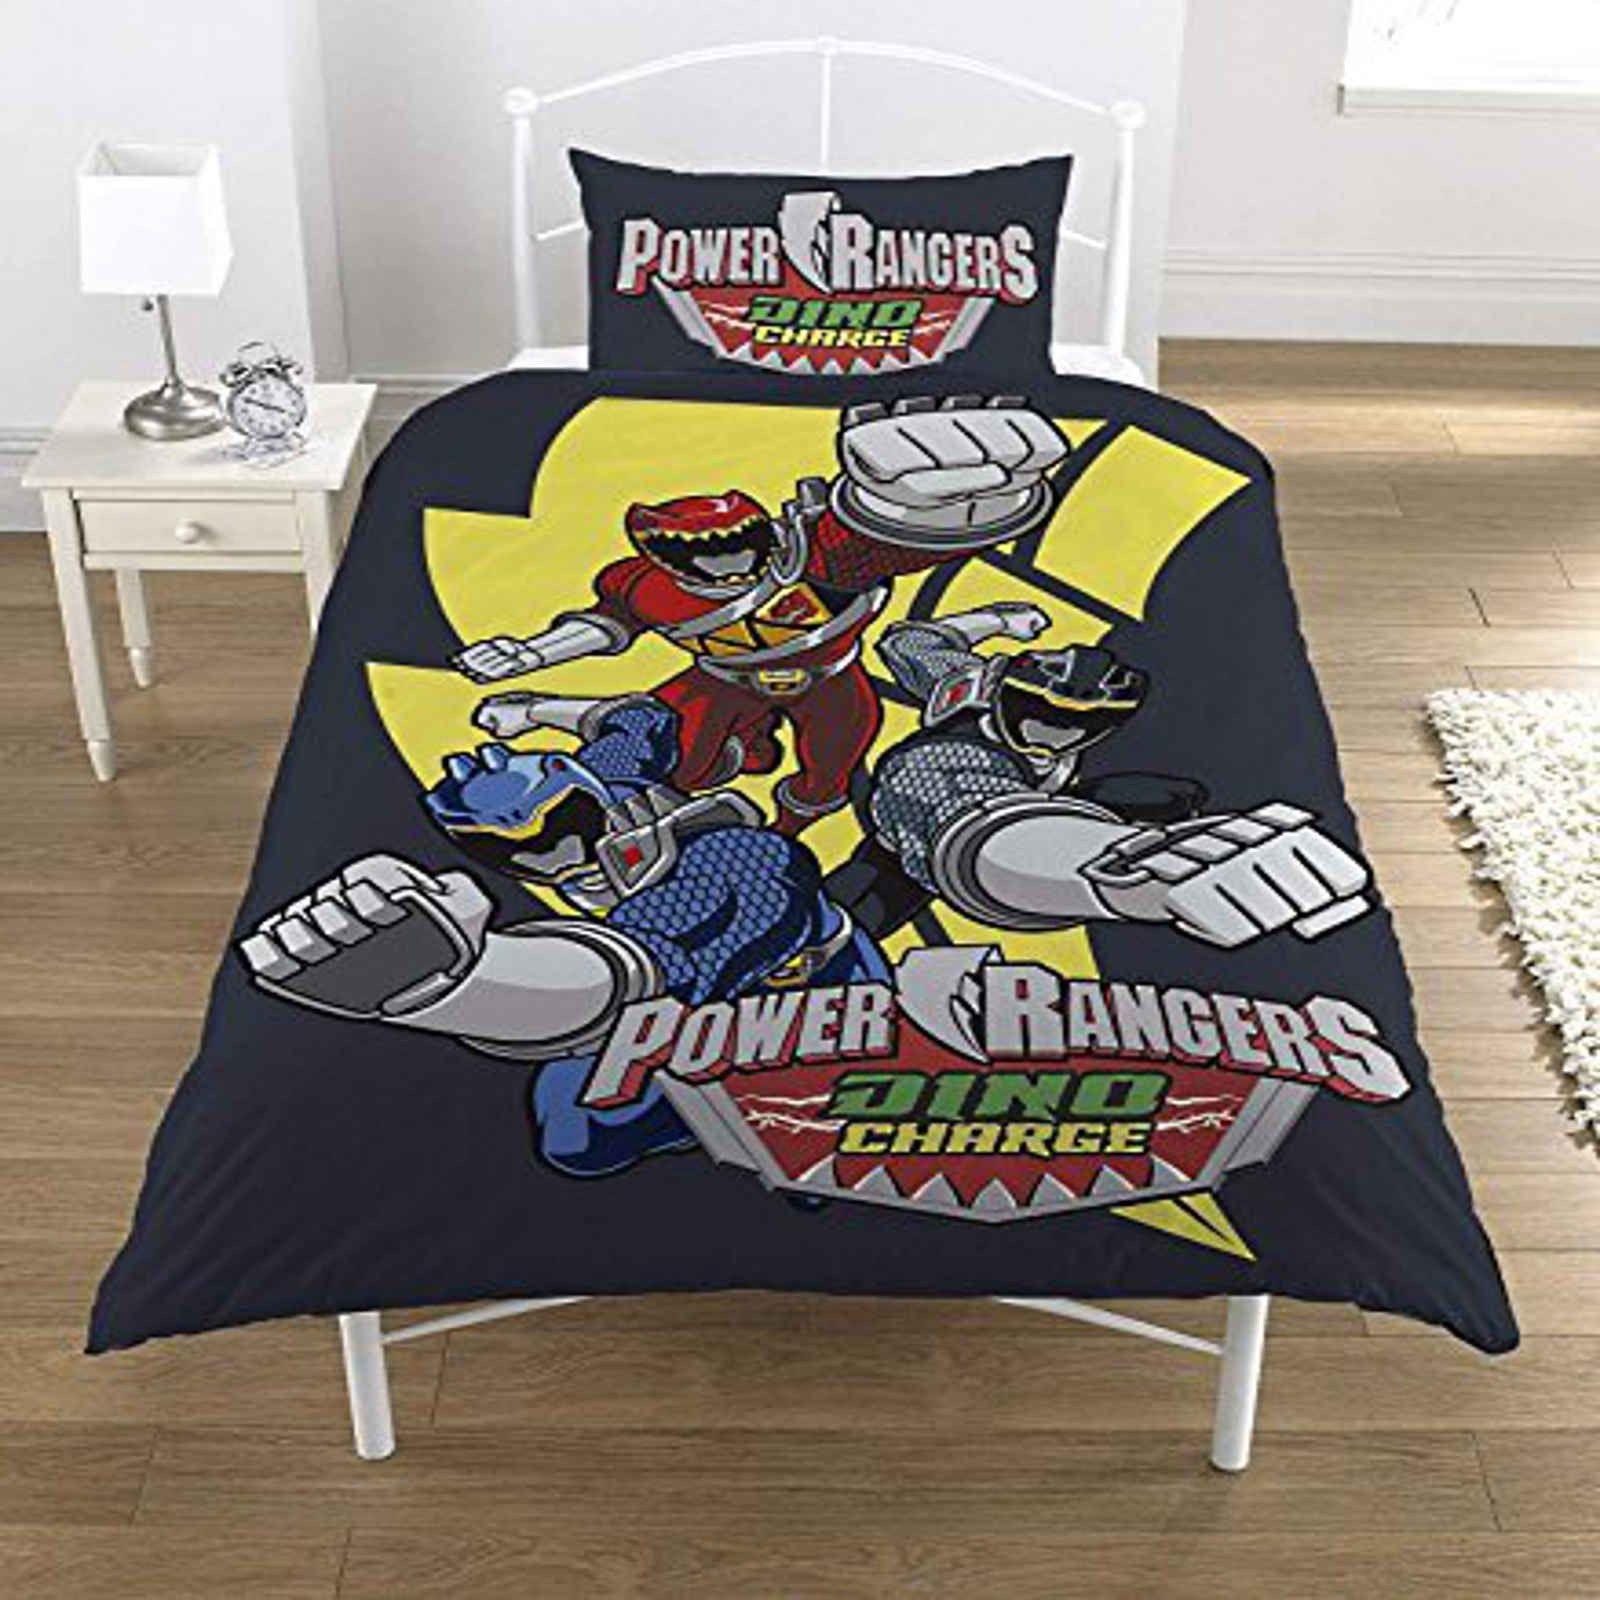 Power Rangers Dino Charge Single Duvet Cover Set Polycotton ...